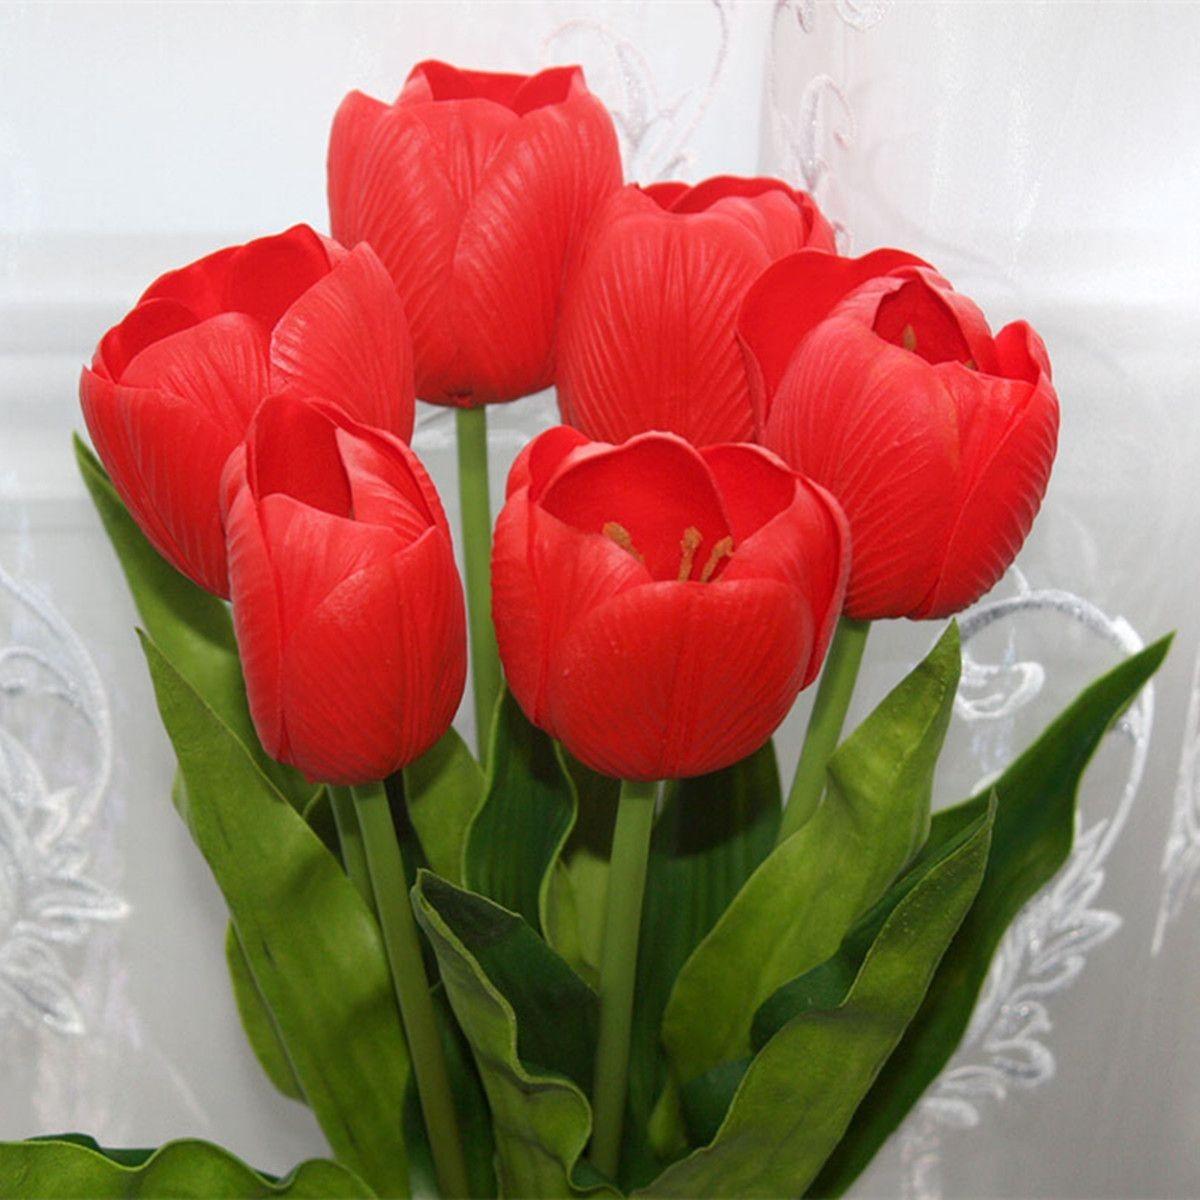 "PU Artificial Tulip Flower/Piece - 23"" - Red"